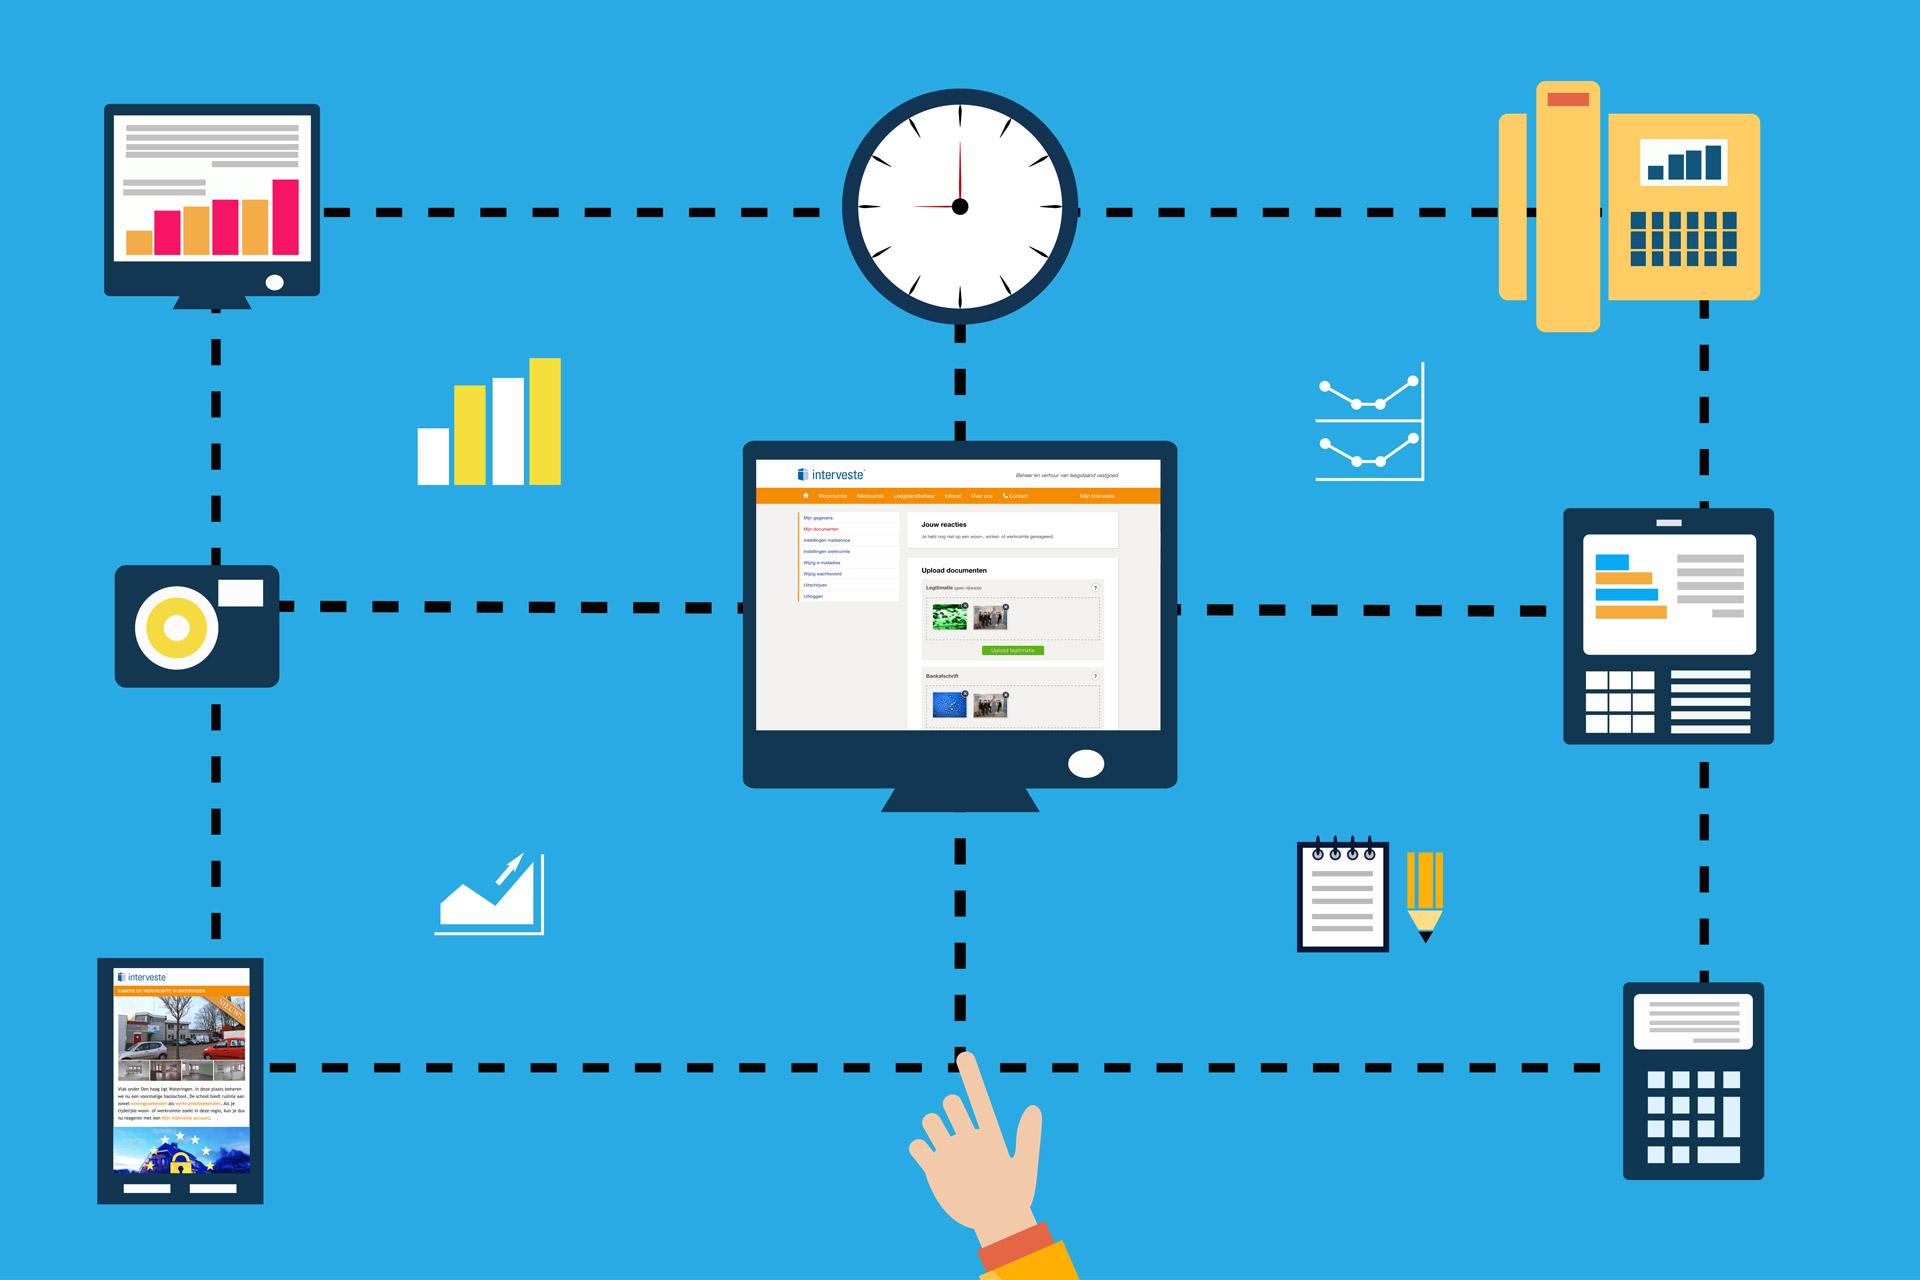 Ipo virtual data site tech service